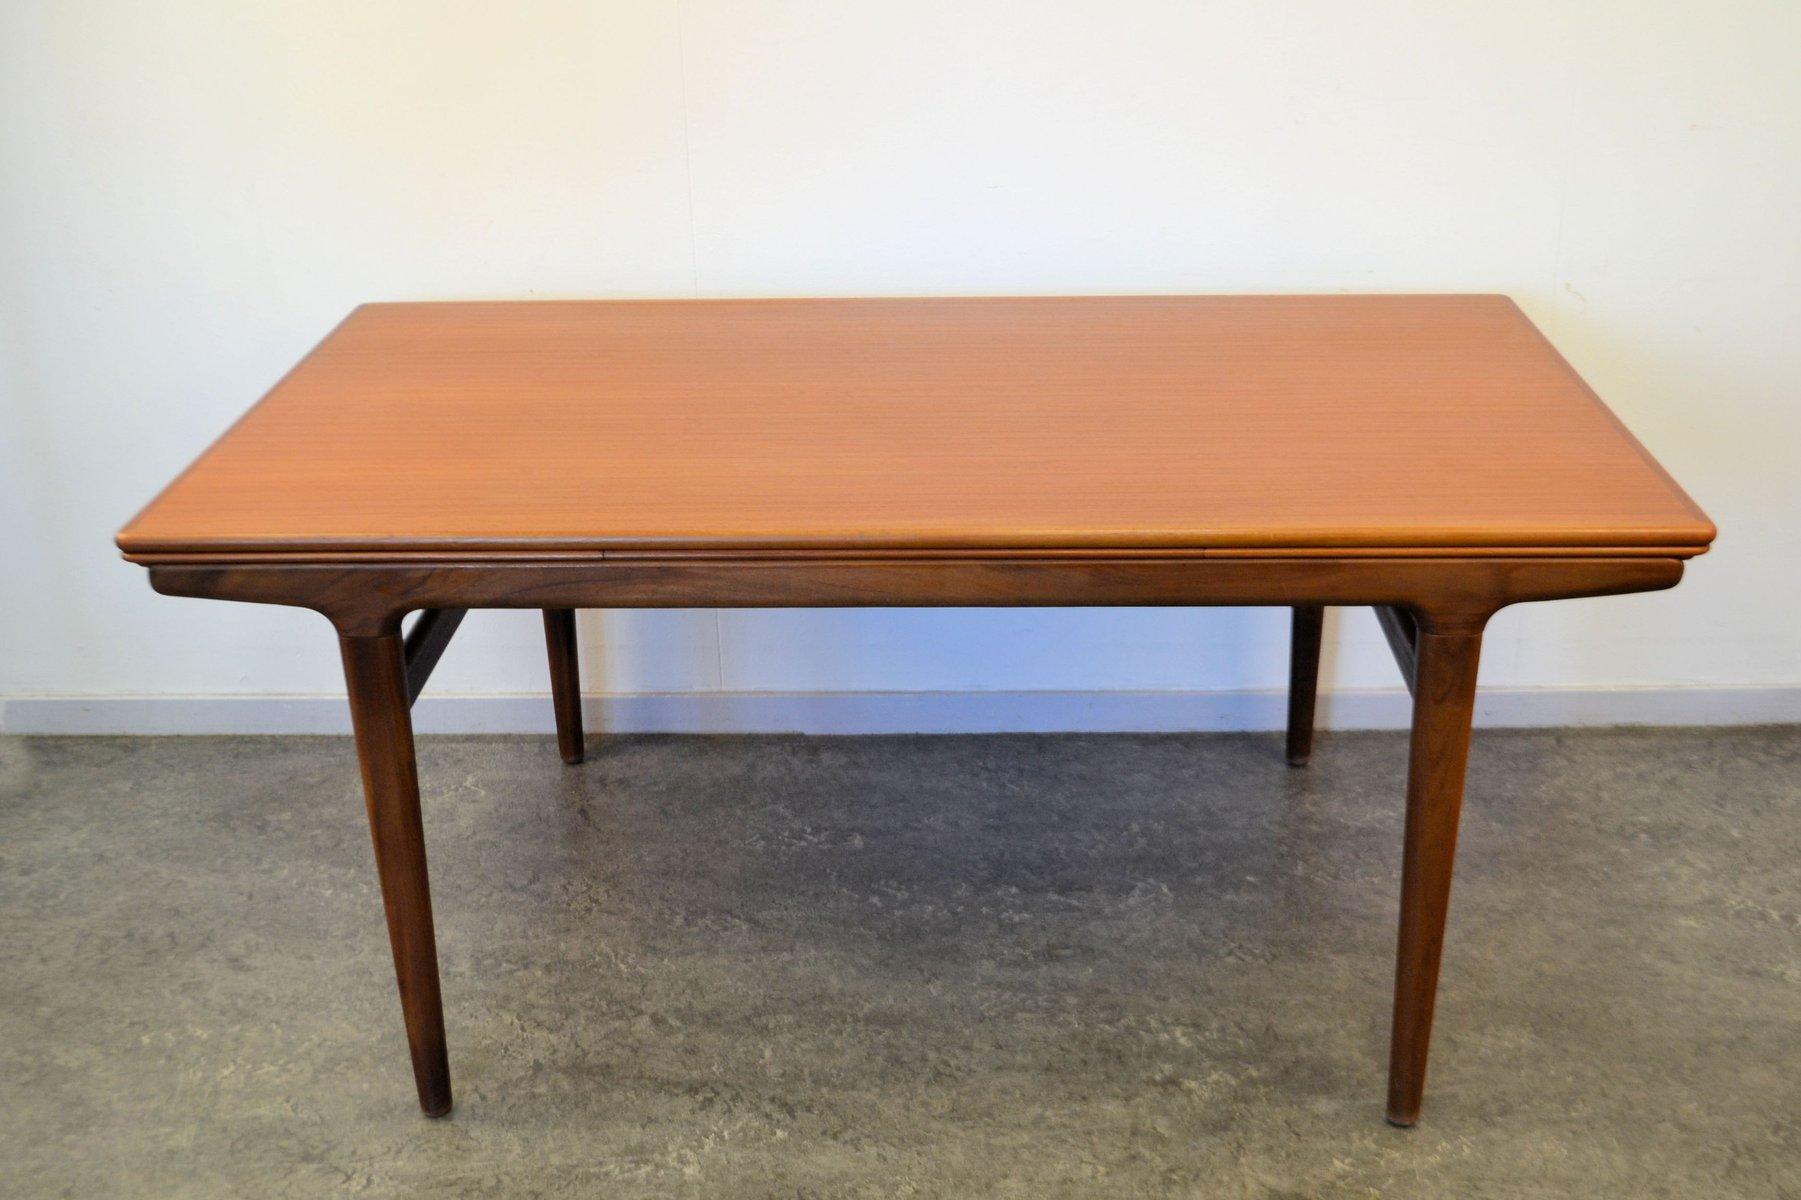 Vintage Danish Teak Dining Table by Johannes Andersen for  : vintage danish teak dining table by johannes andersen for udlum mobelfabrik 3 from www.pamono.com size 1801 x 1200 jpeg 131kB